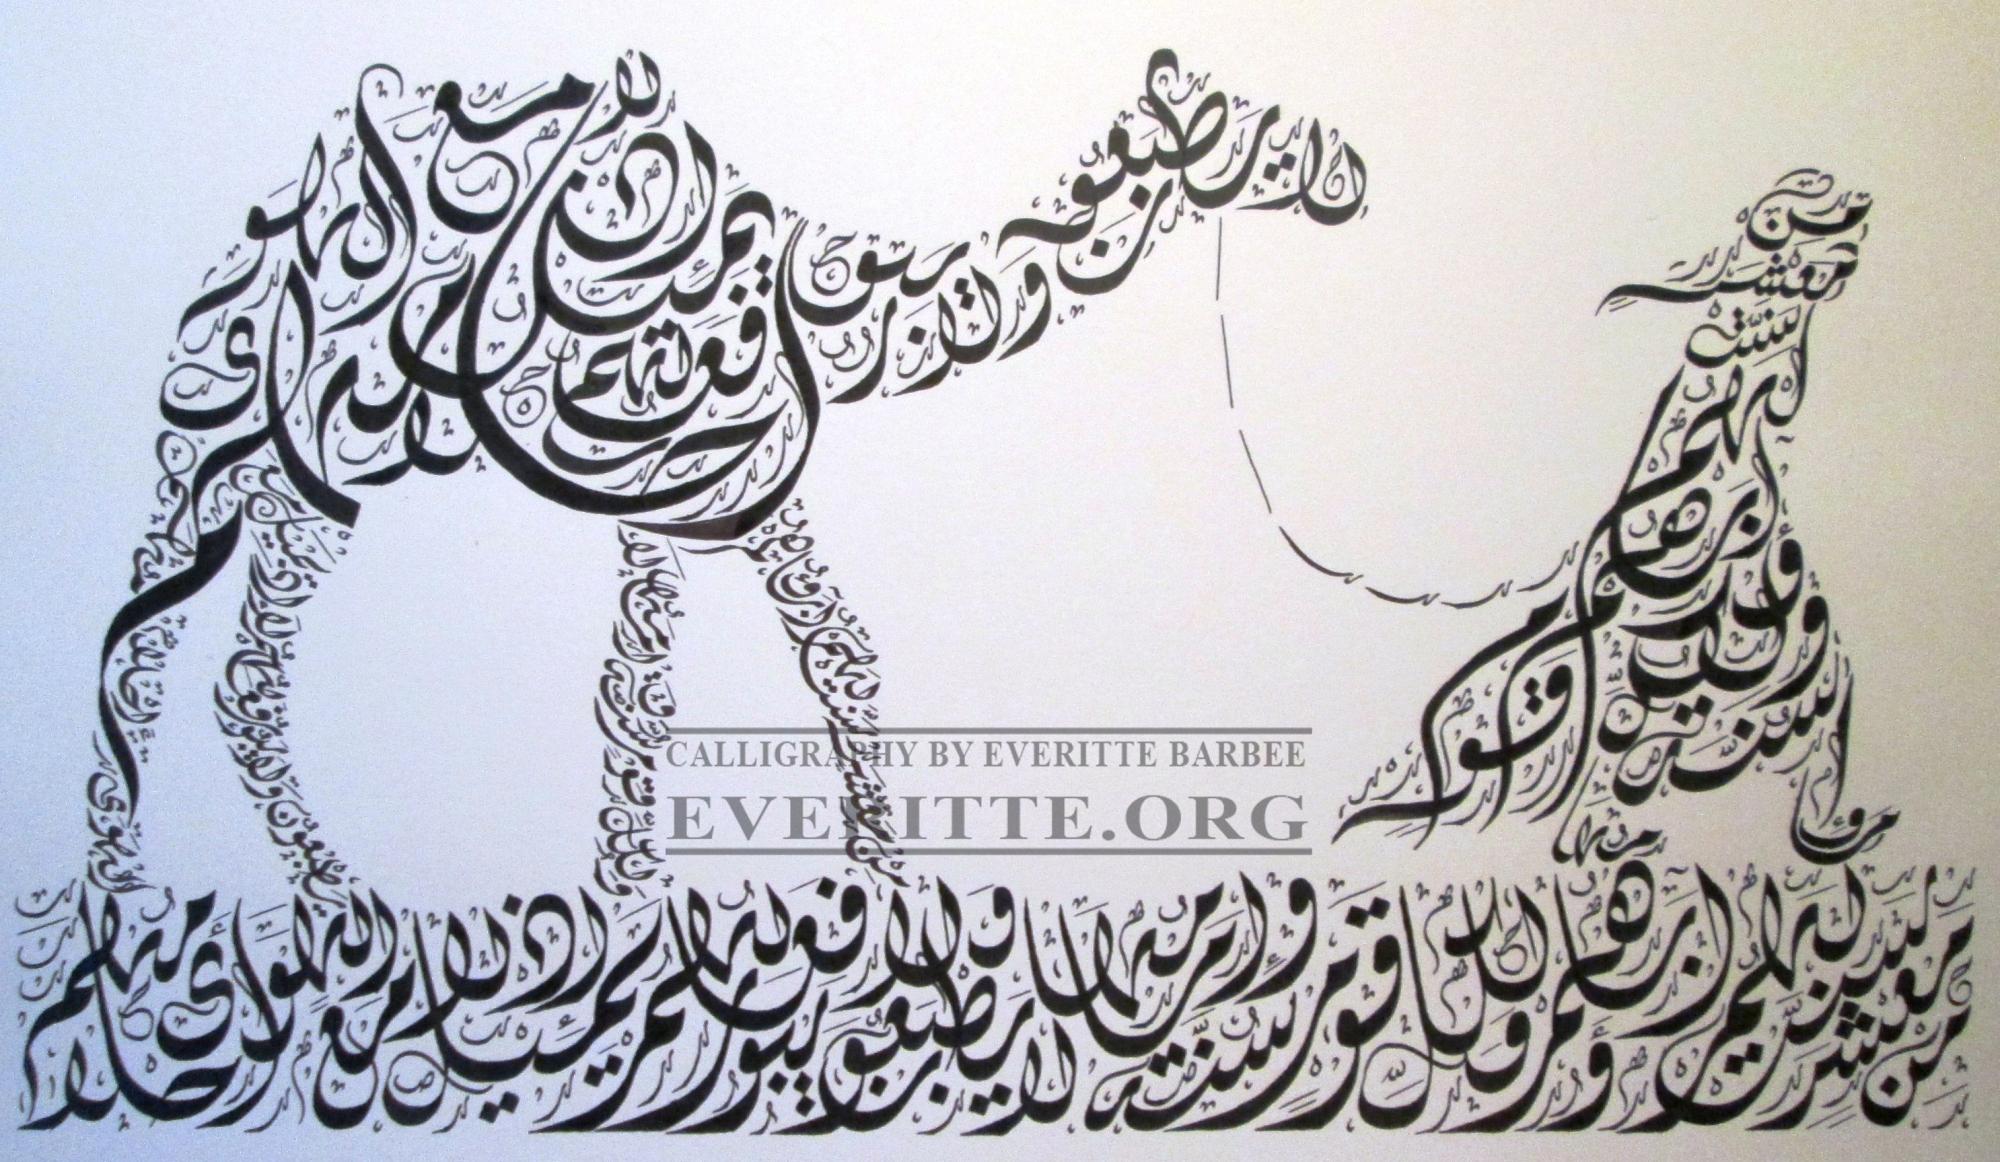 2000x1162 Bricolage Calligraphy, Arabic Calligraphy